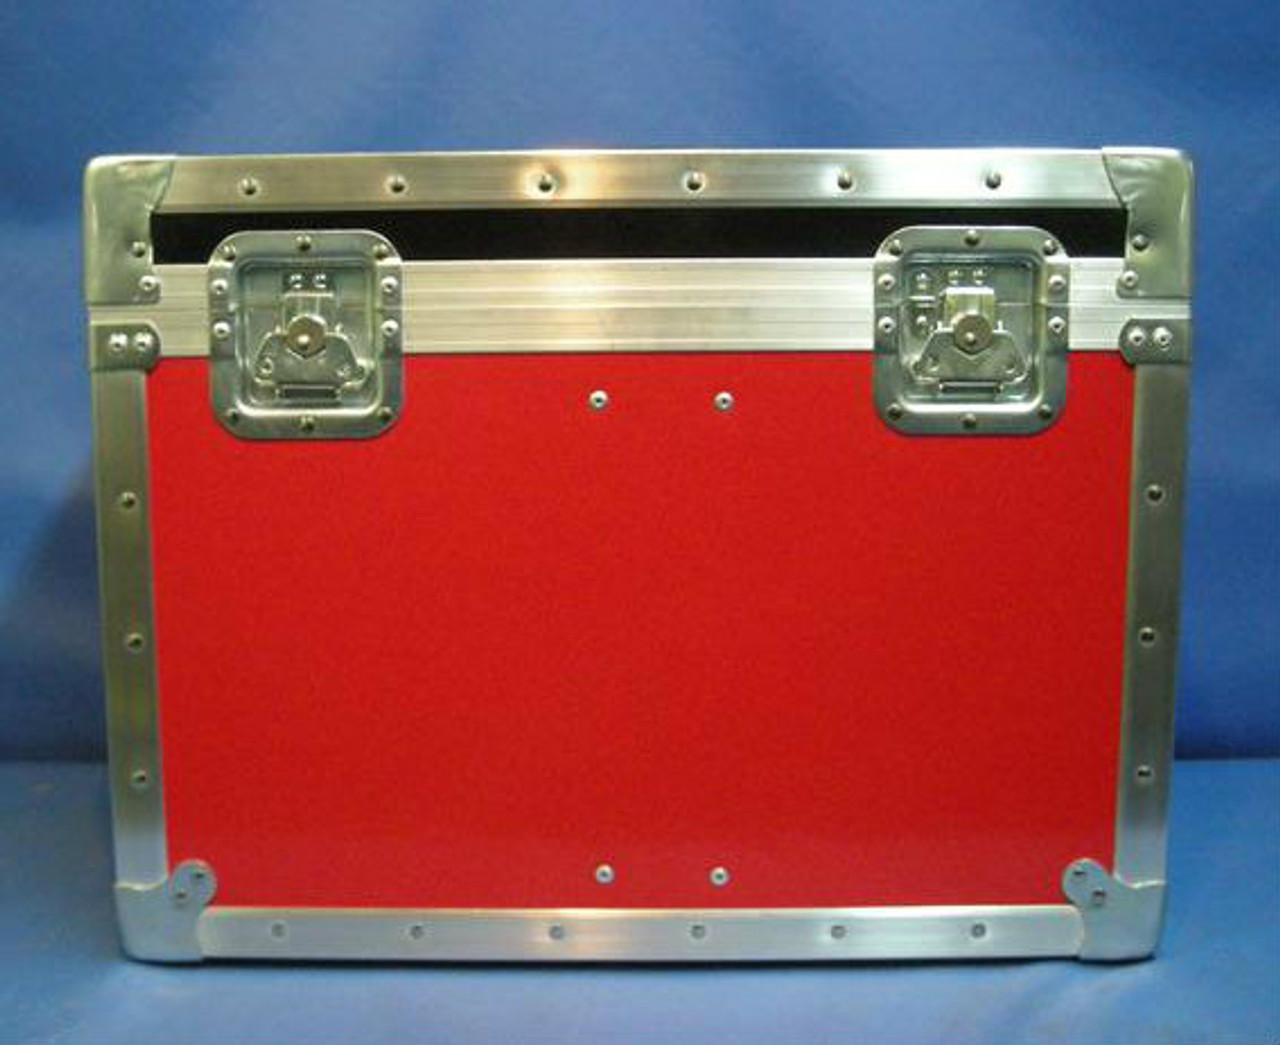 Panasonic BT-LH 17 Series Custom ATA Shipping Case - Exterior View